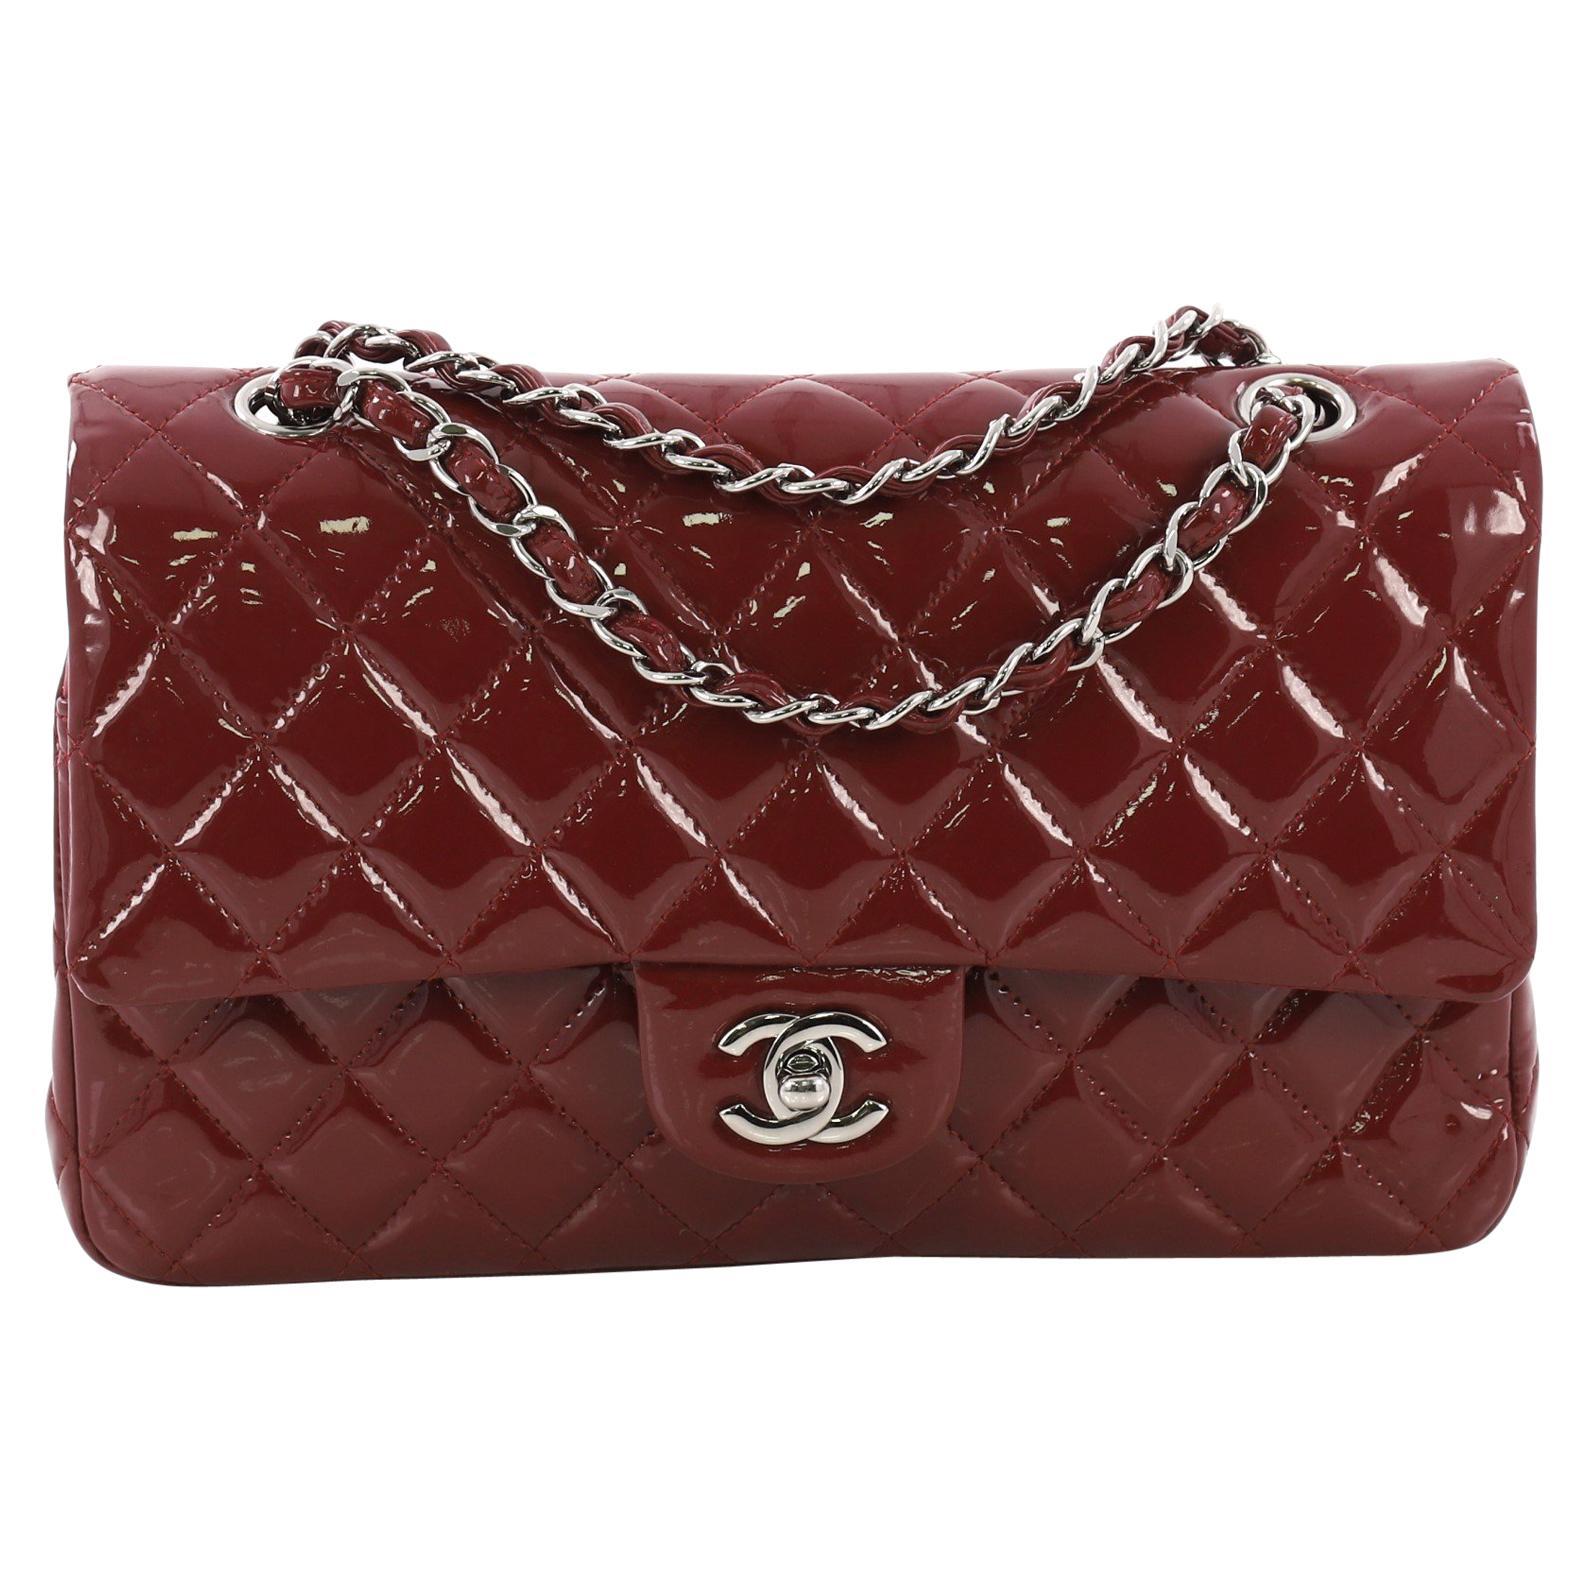 03d14b0eb00a Vintage Chanel  Bags